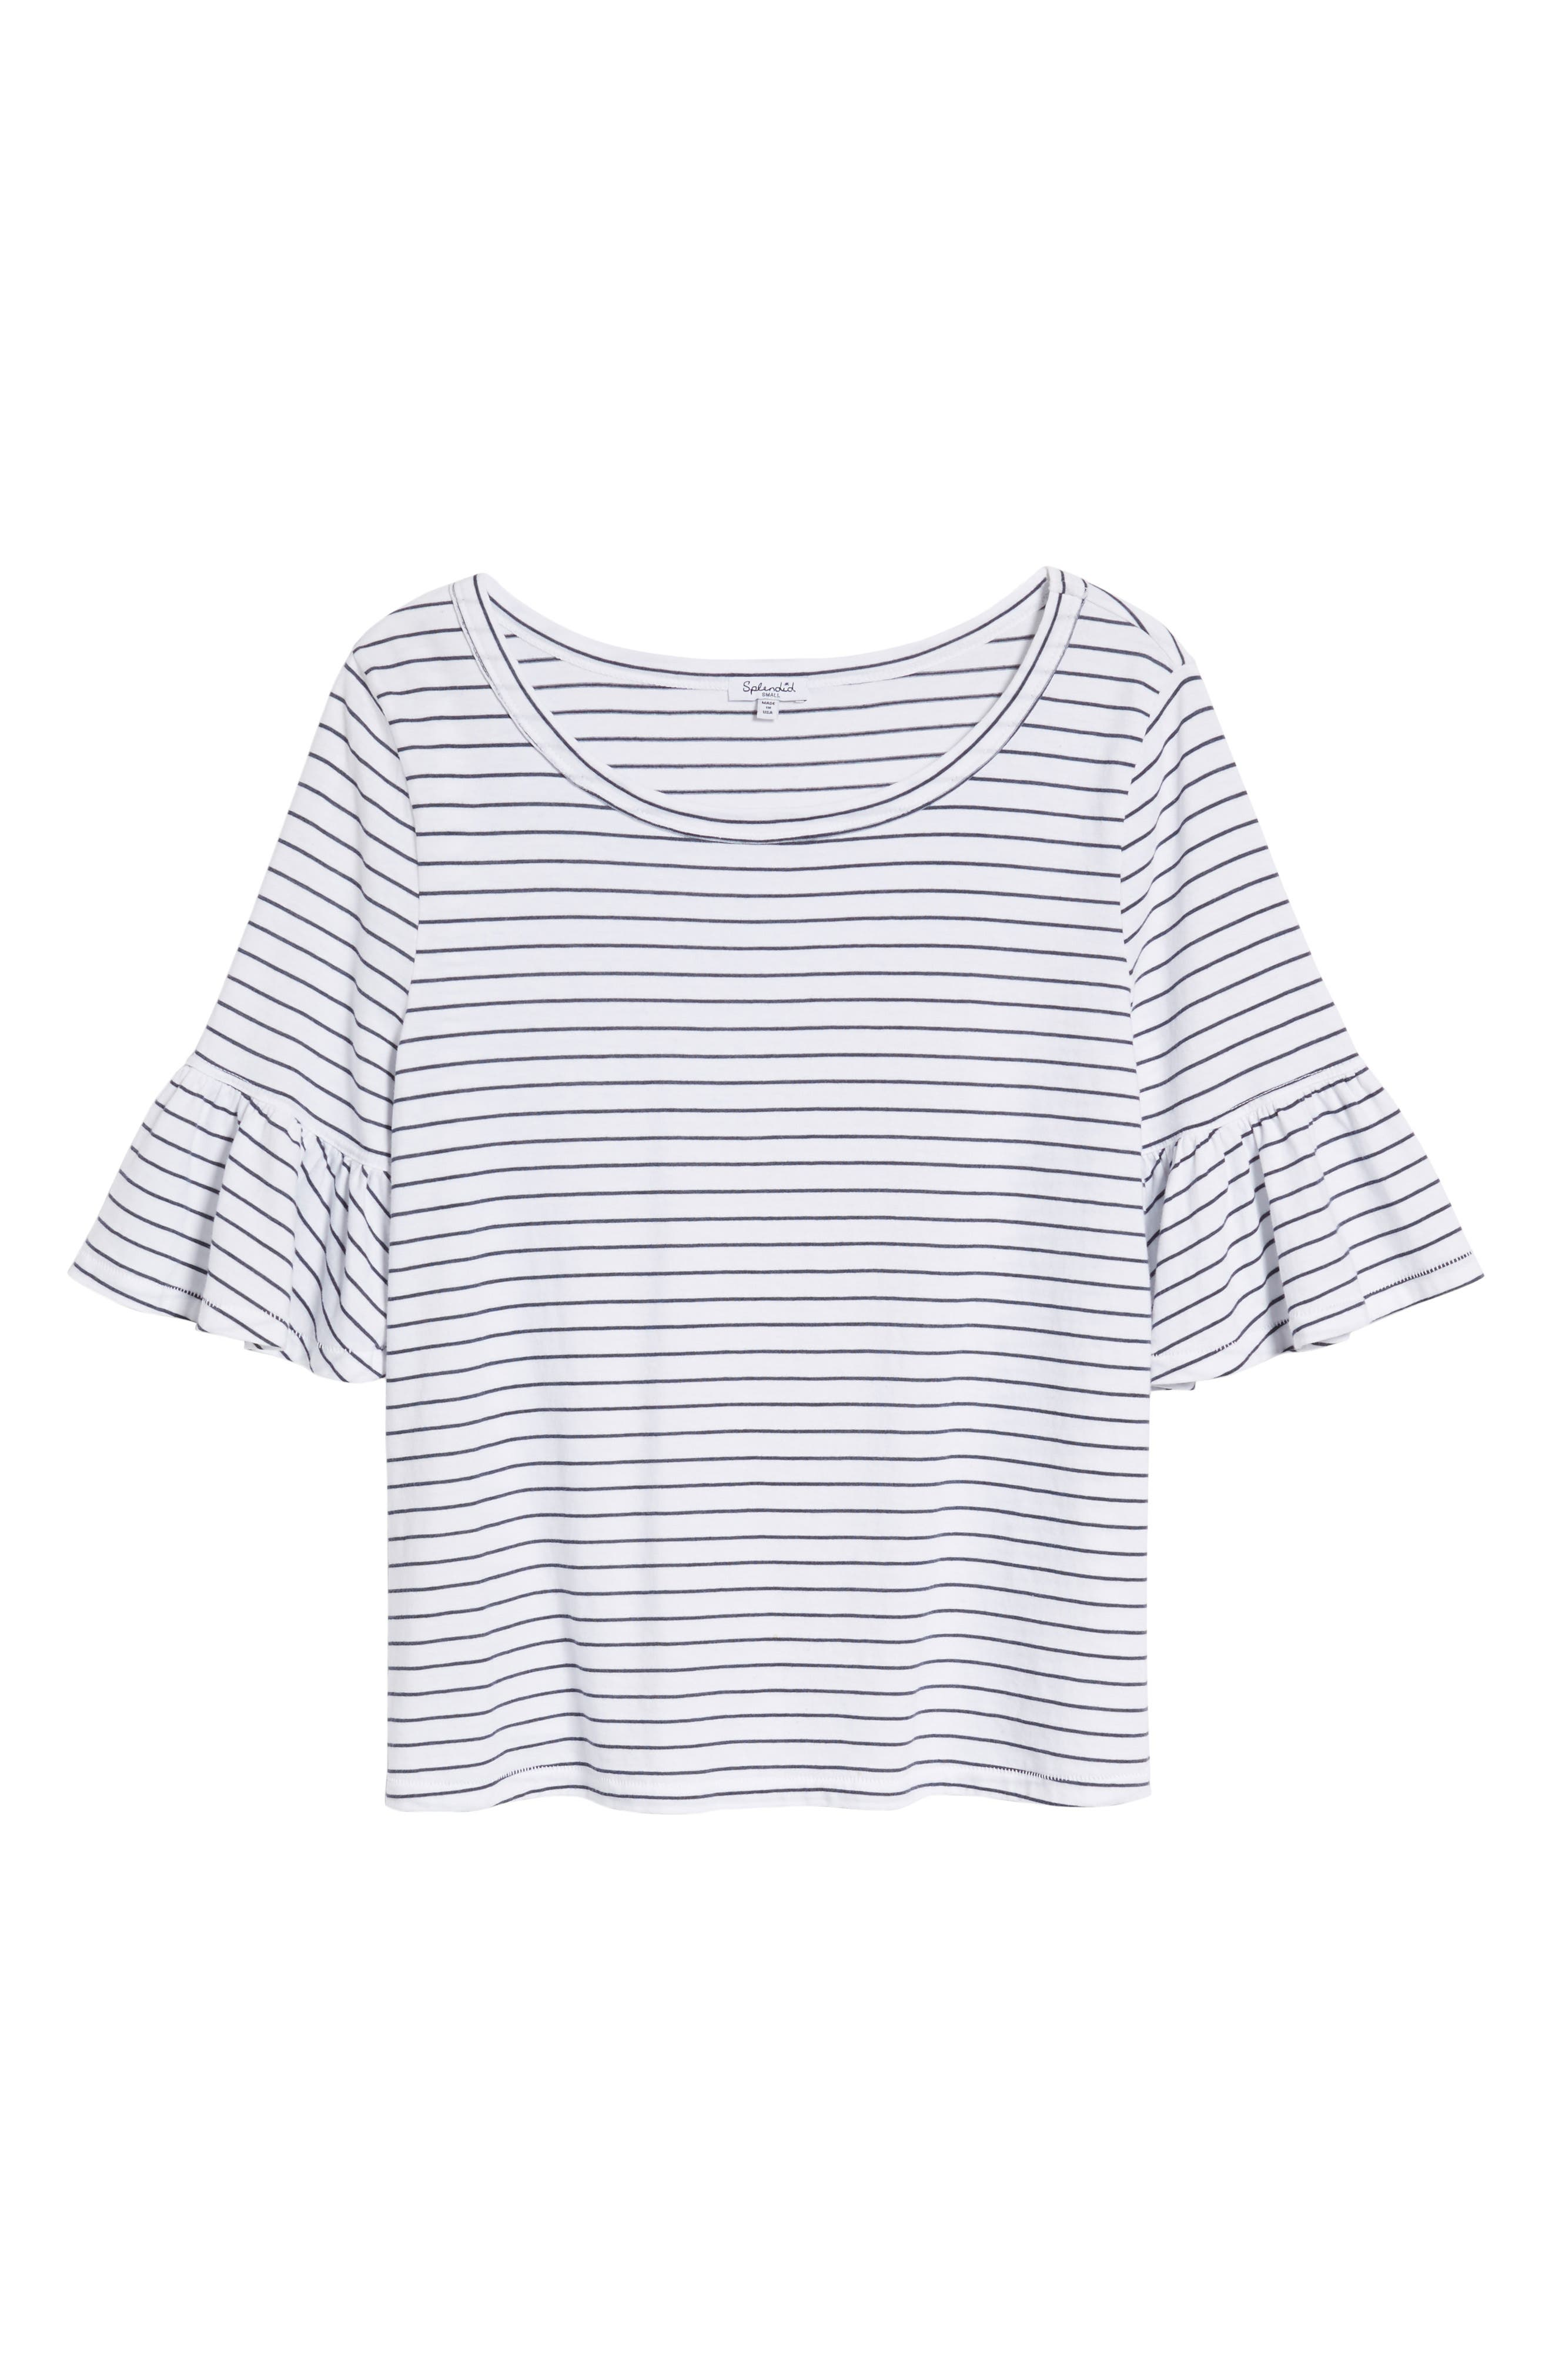 Stripe Ruffle Sleeve Tee,                             Alternate thumbnail 7, color,                             White/ Navy